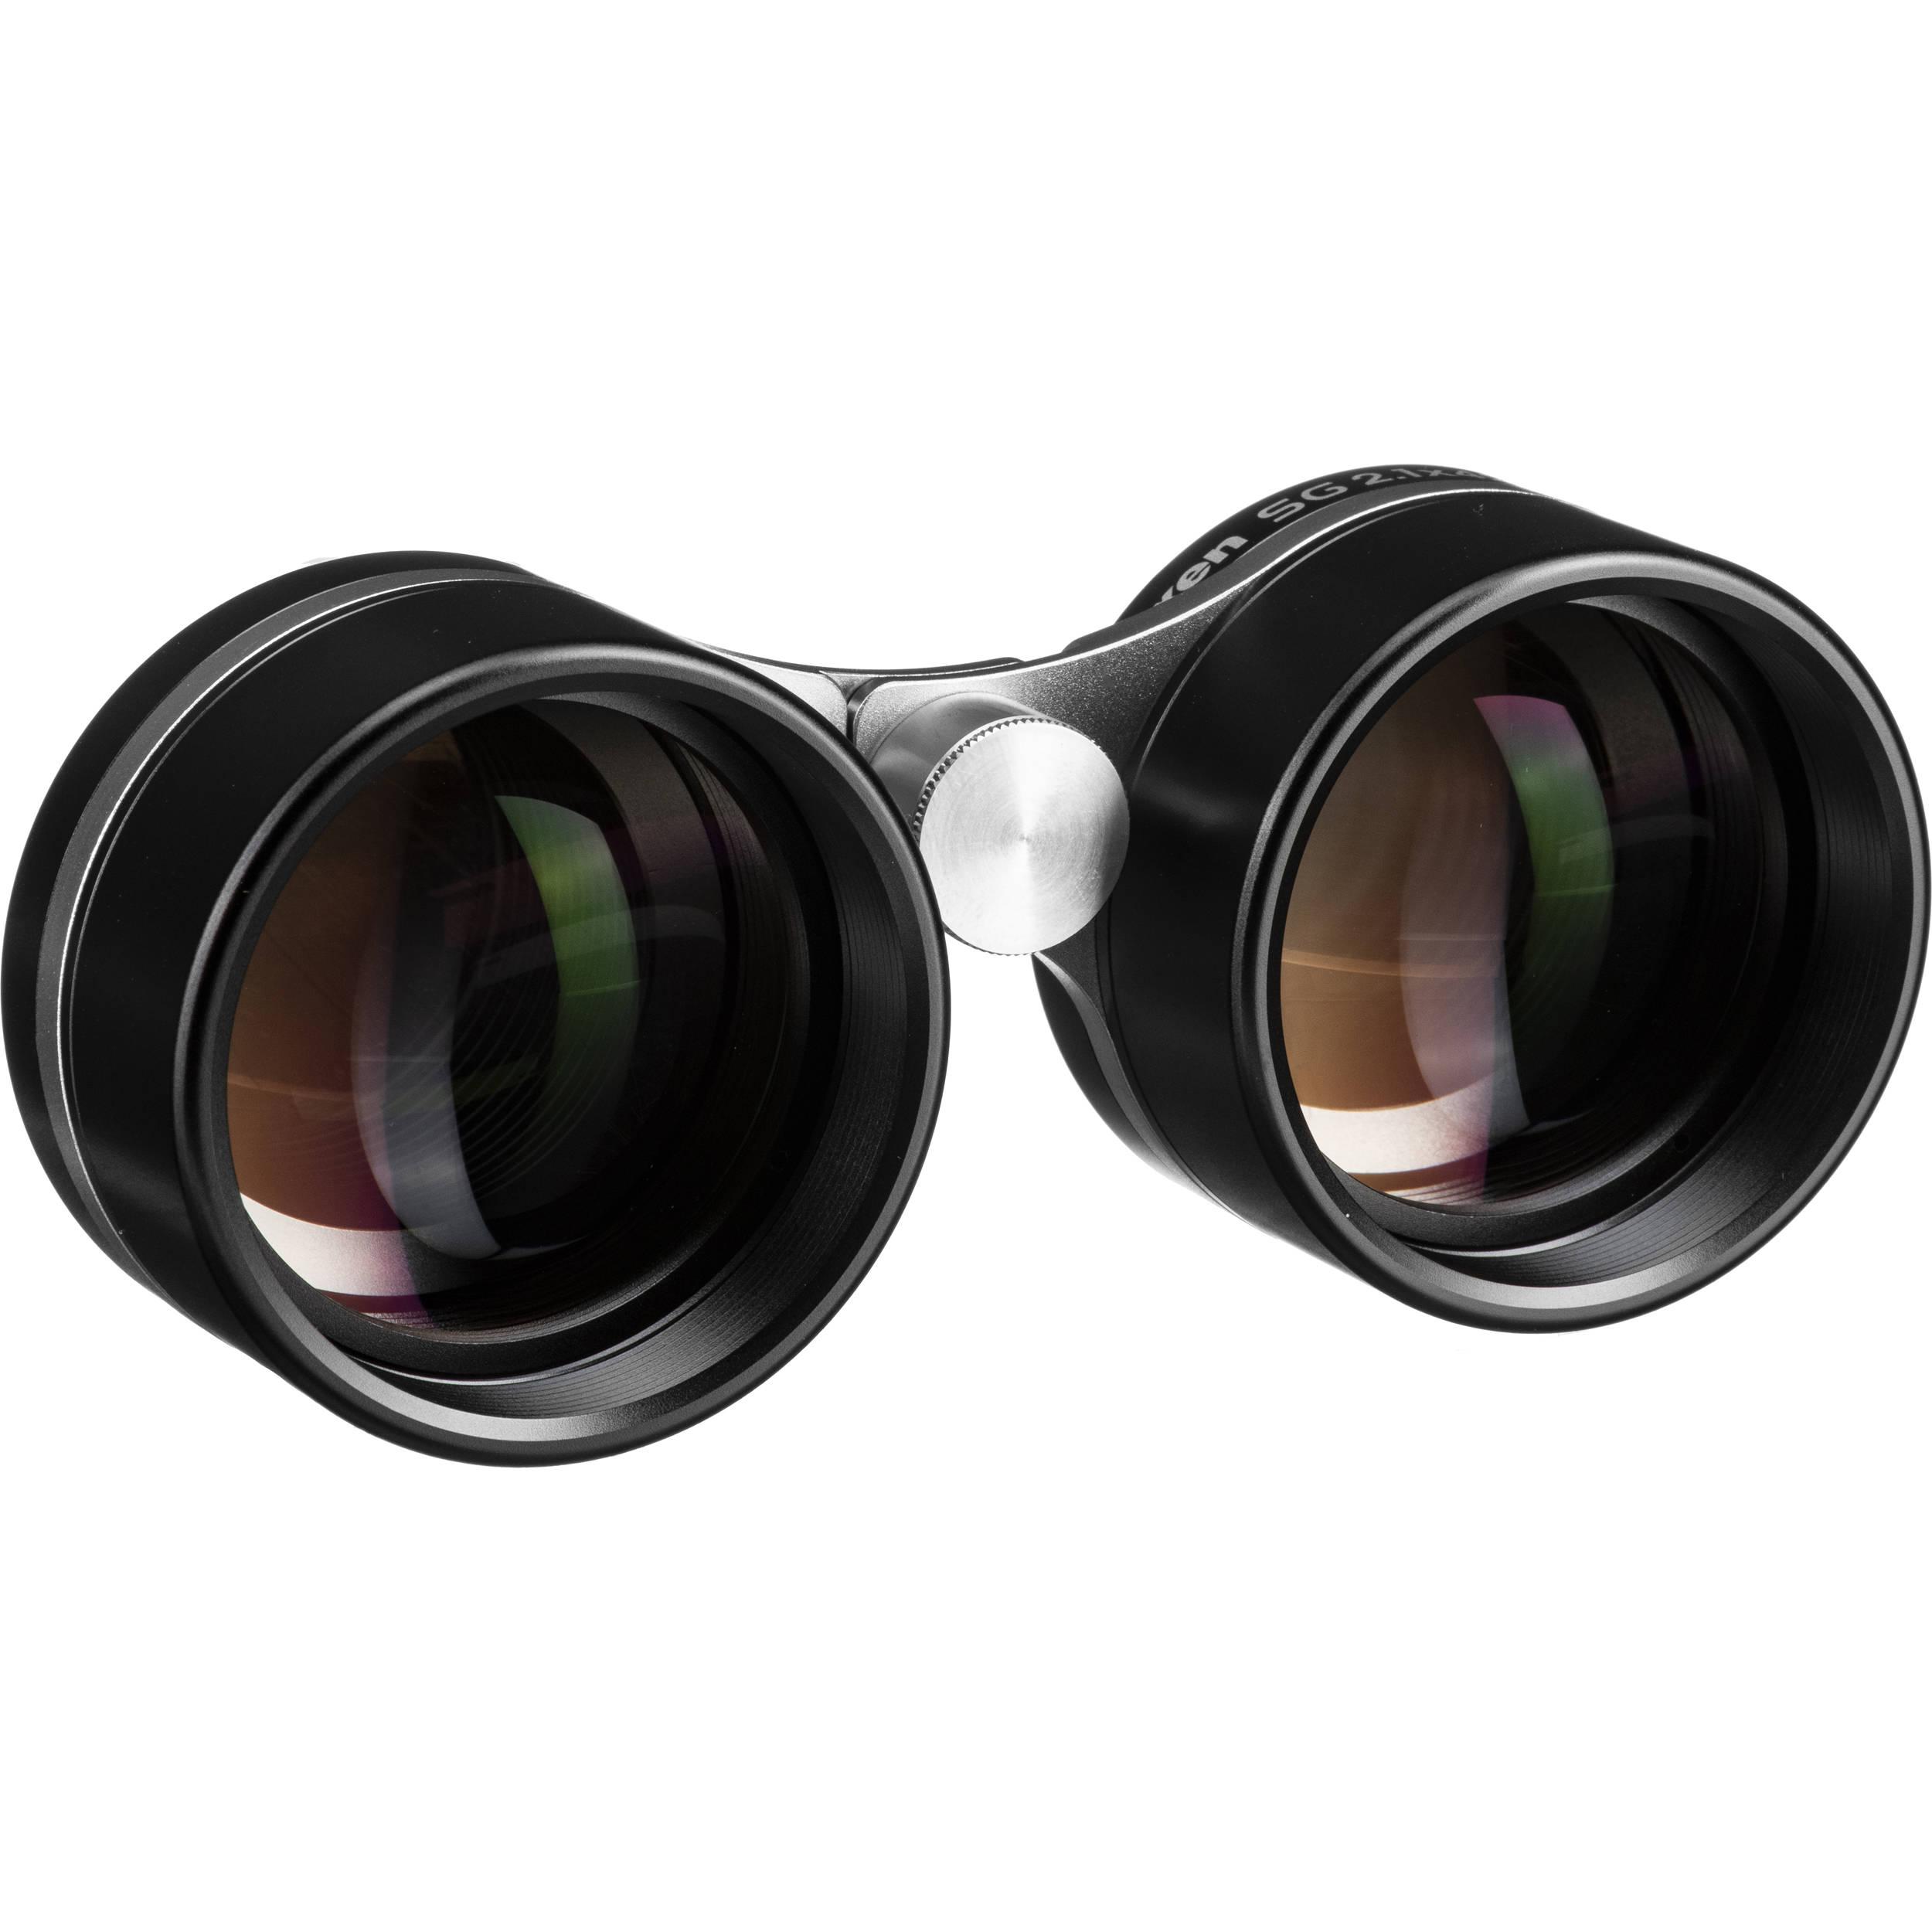 Clear Progrip Double Pane Light Sensitive Anti-Fog Anti-Scratch Millennium Lens